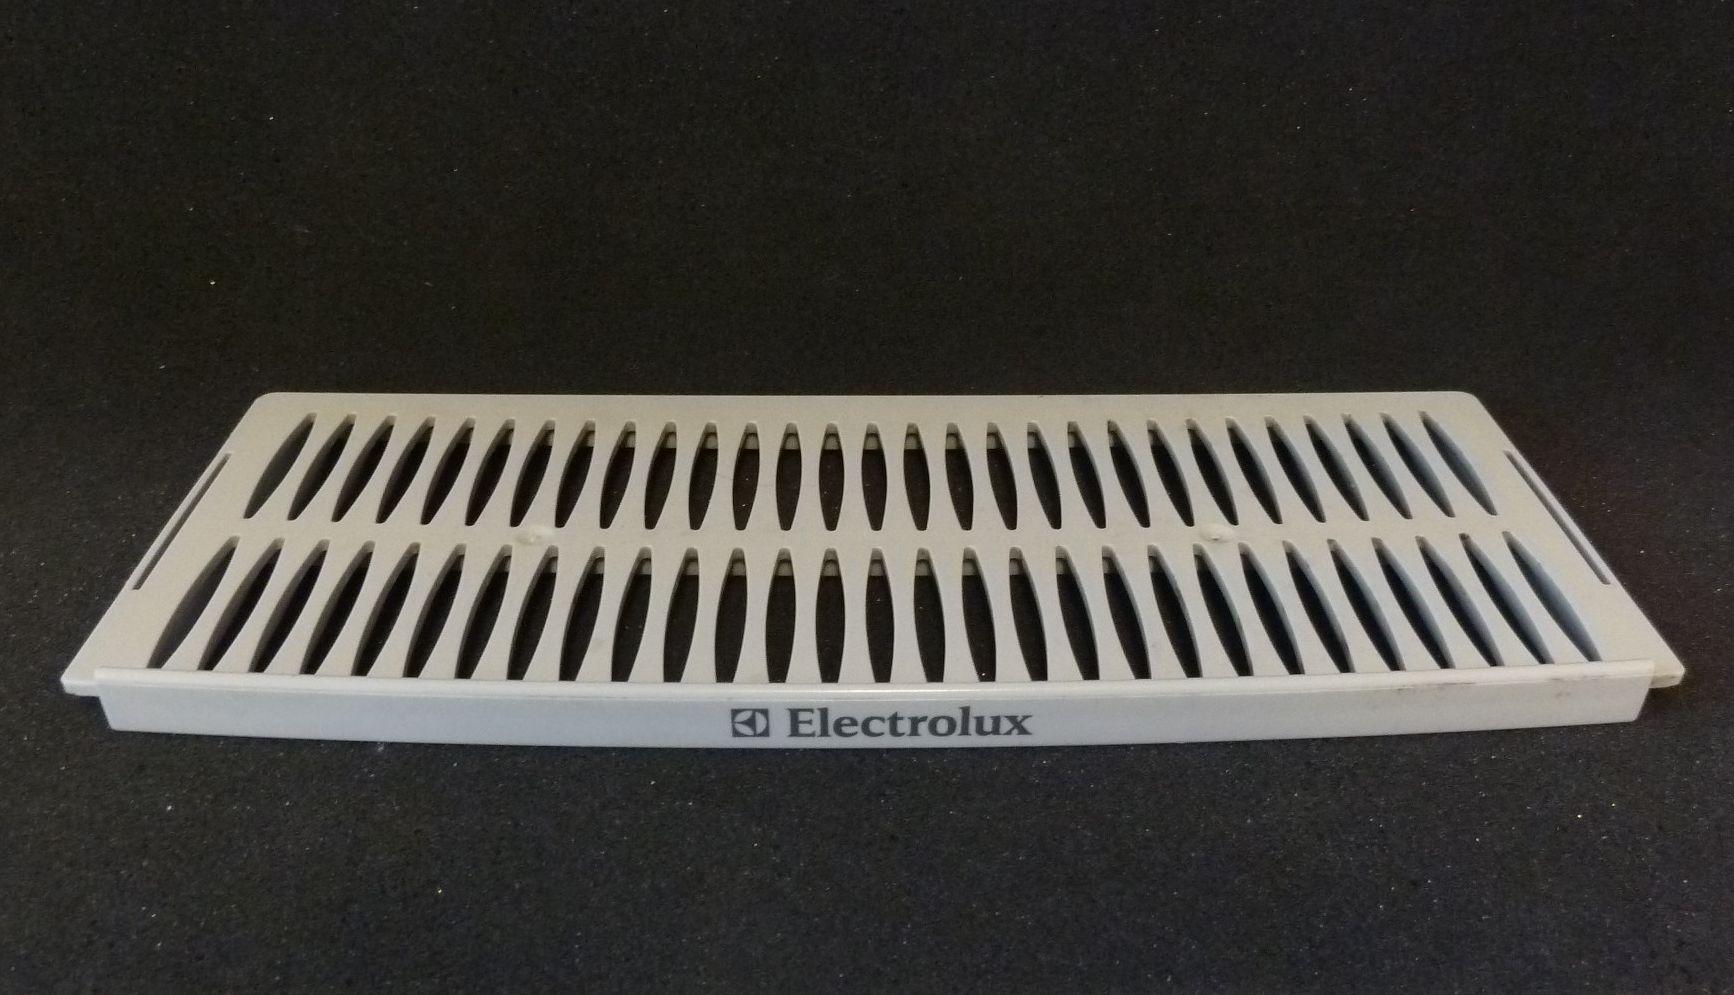 Minibar Kühlschrank Electrolux : Kühlschrank gewicht ac v a pin gefrierfach kuehlschrank